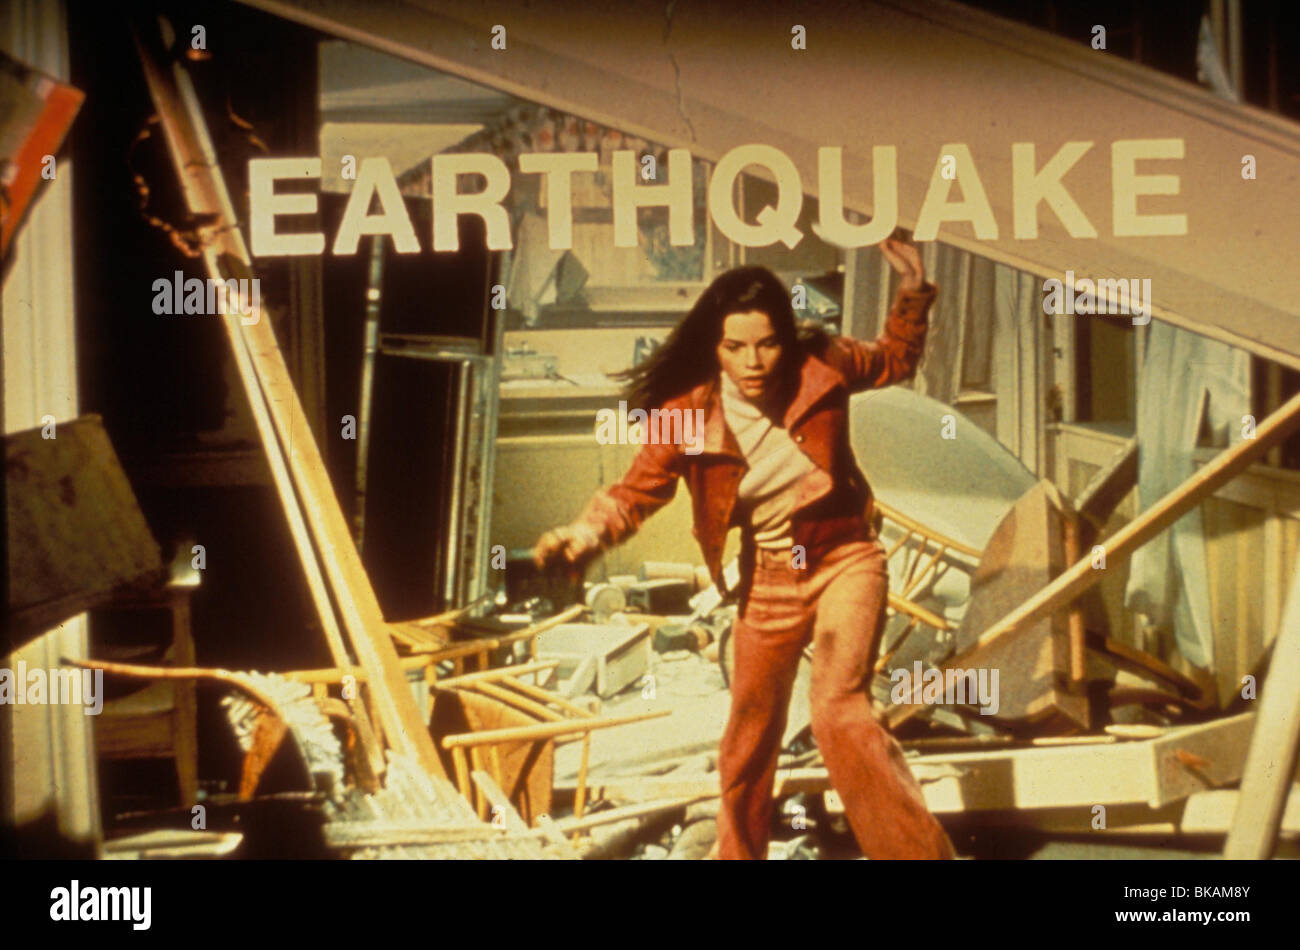 EARTHQUAKE (1974) GENEVIEVE BUJOLD ERQ 018 L Stock Photo